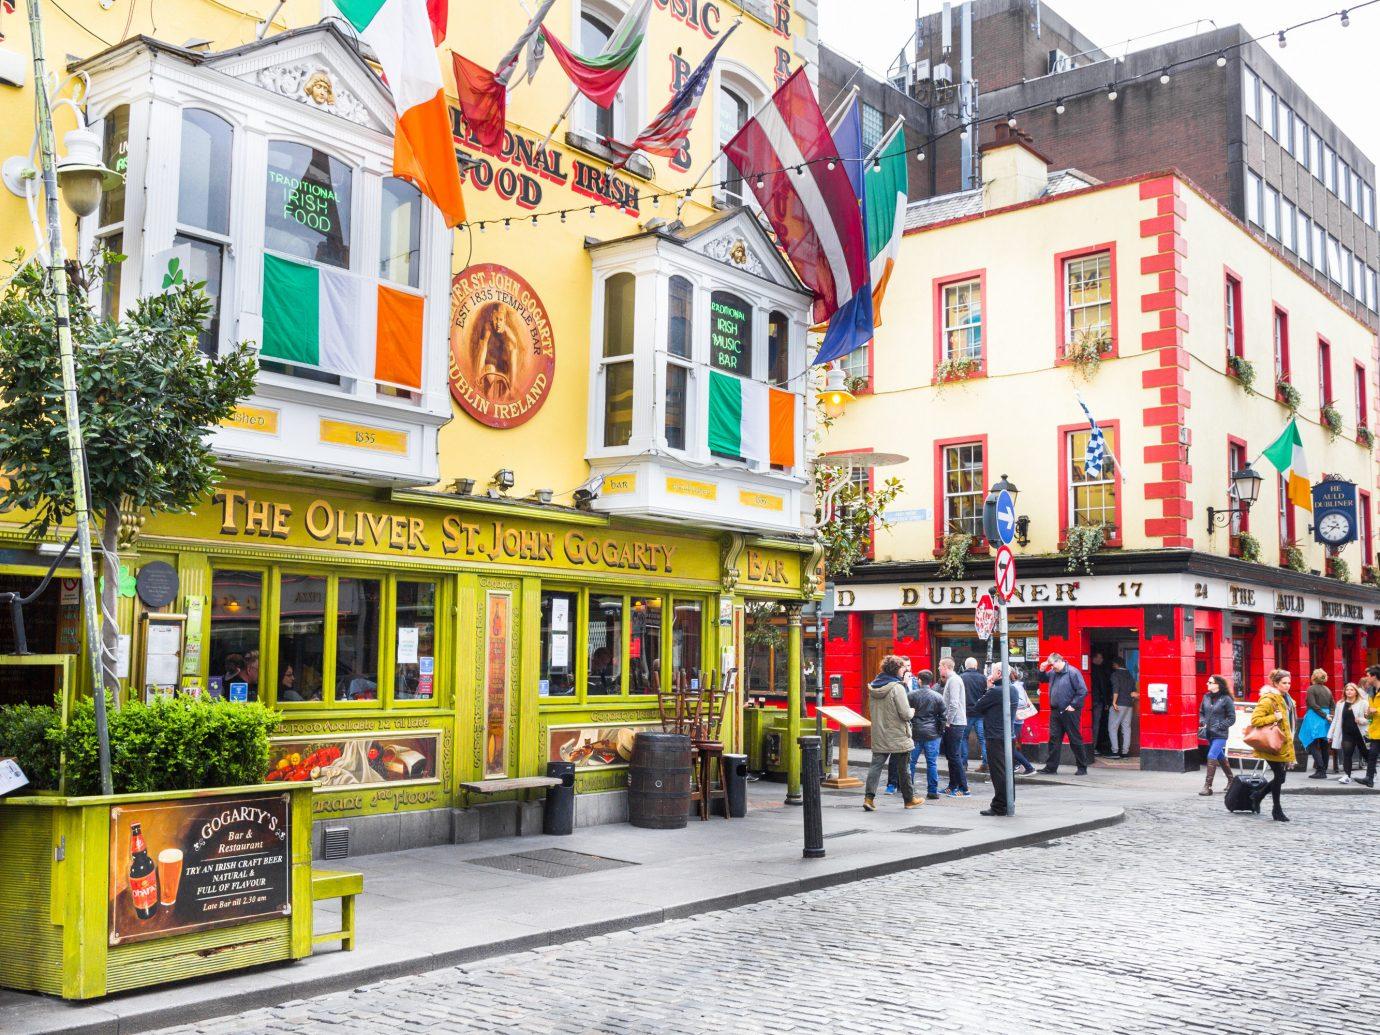 Dublin Ireland Travel Tips Trip Ideas building outdoor Town neighbourhood City street mixed use urban area scene way metropolitan area pedestrian metropolis town square facade marketplace sidewalk colorful